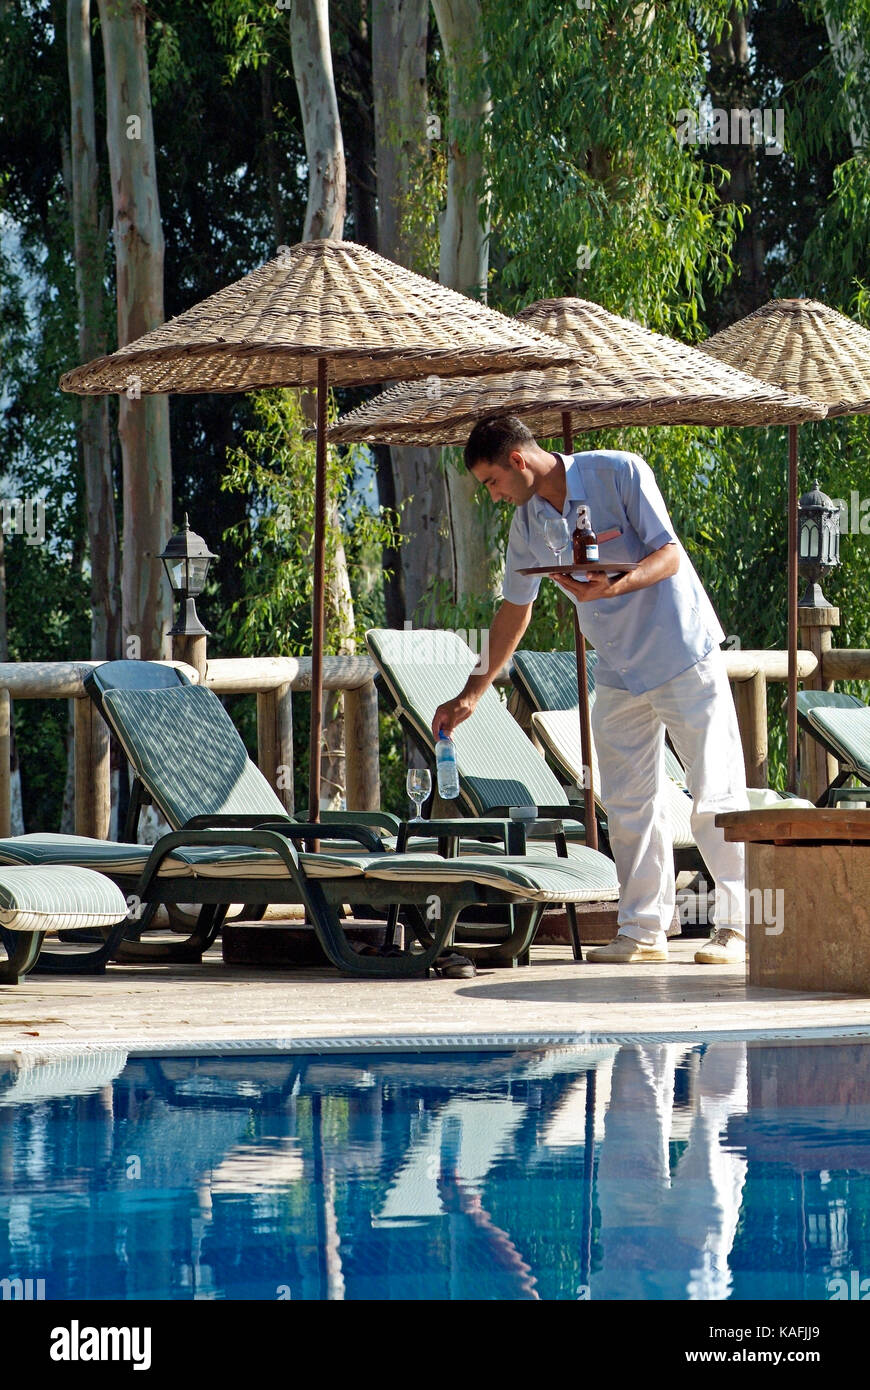 waiter collecting empties beside swimming pool akyaka turkey - Stock Image